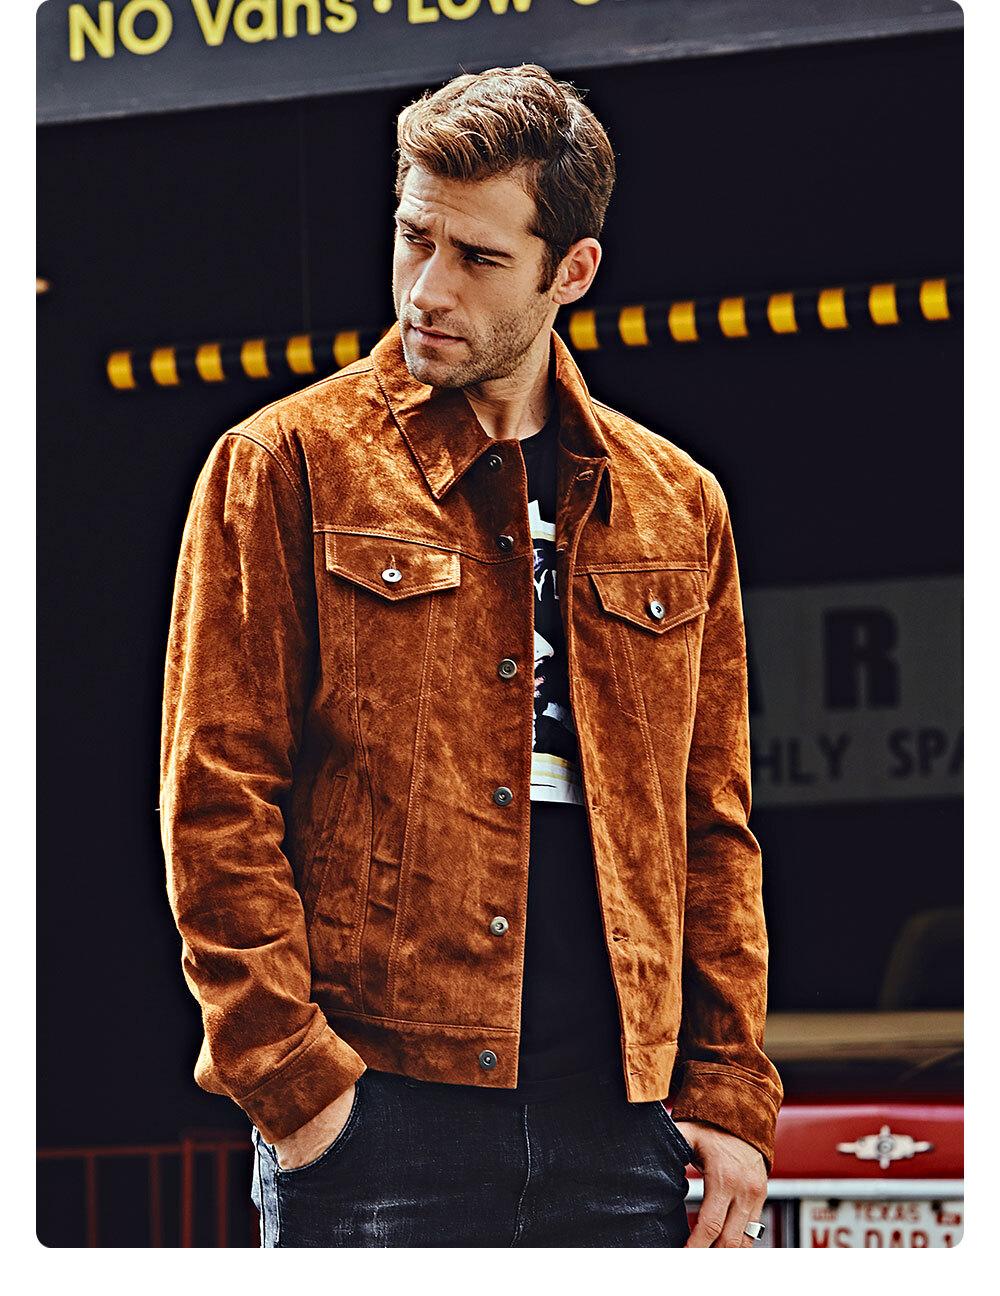 Men's Leather Denim Jacket BrownDiscount 100% polyester flavor leather denim jacket| buy discount 100% polyester flavor leather denim jacket